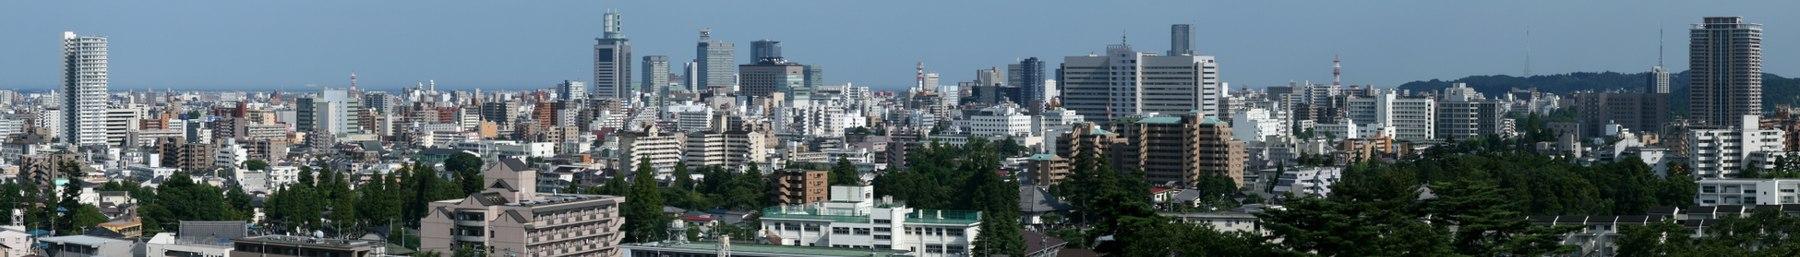 Sendai banner.jpg